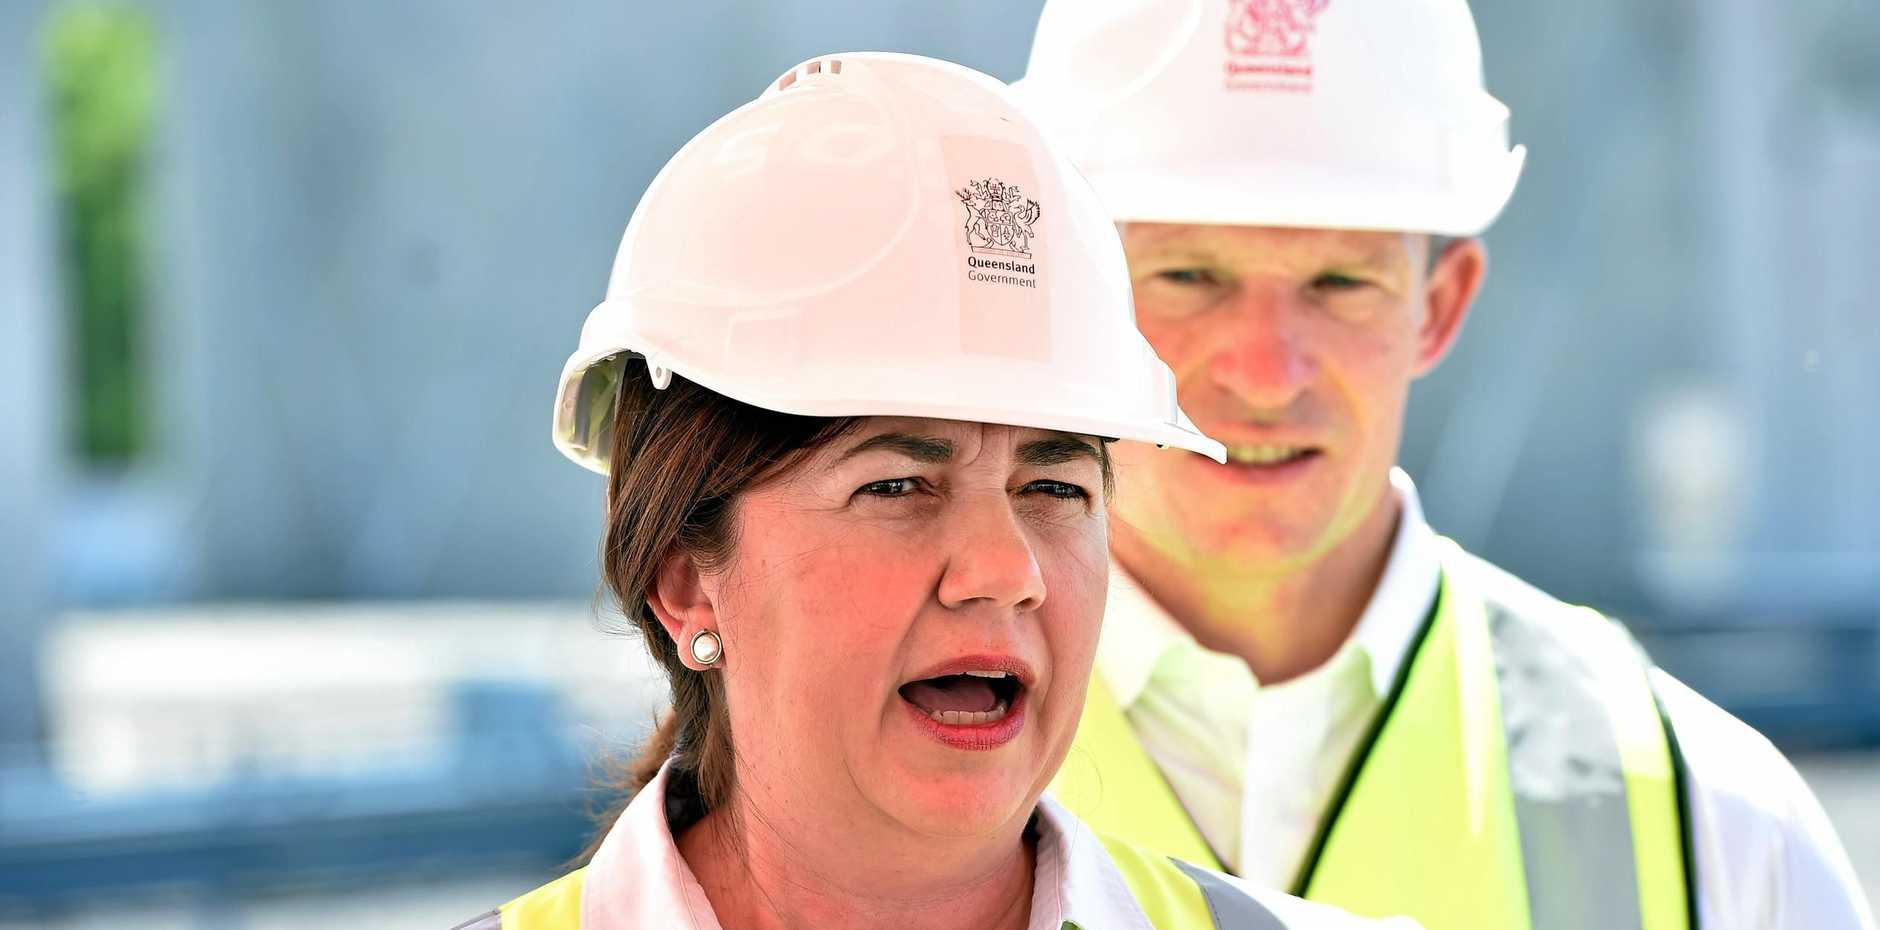 Queensland Premier defends Townsville MPs over Adani